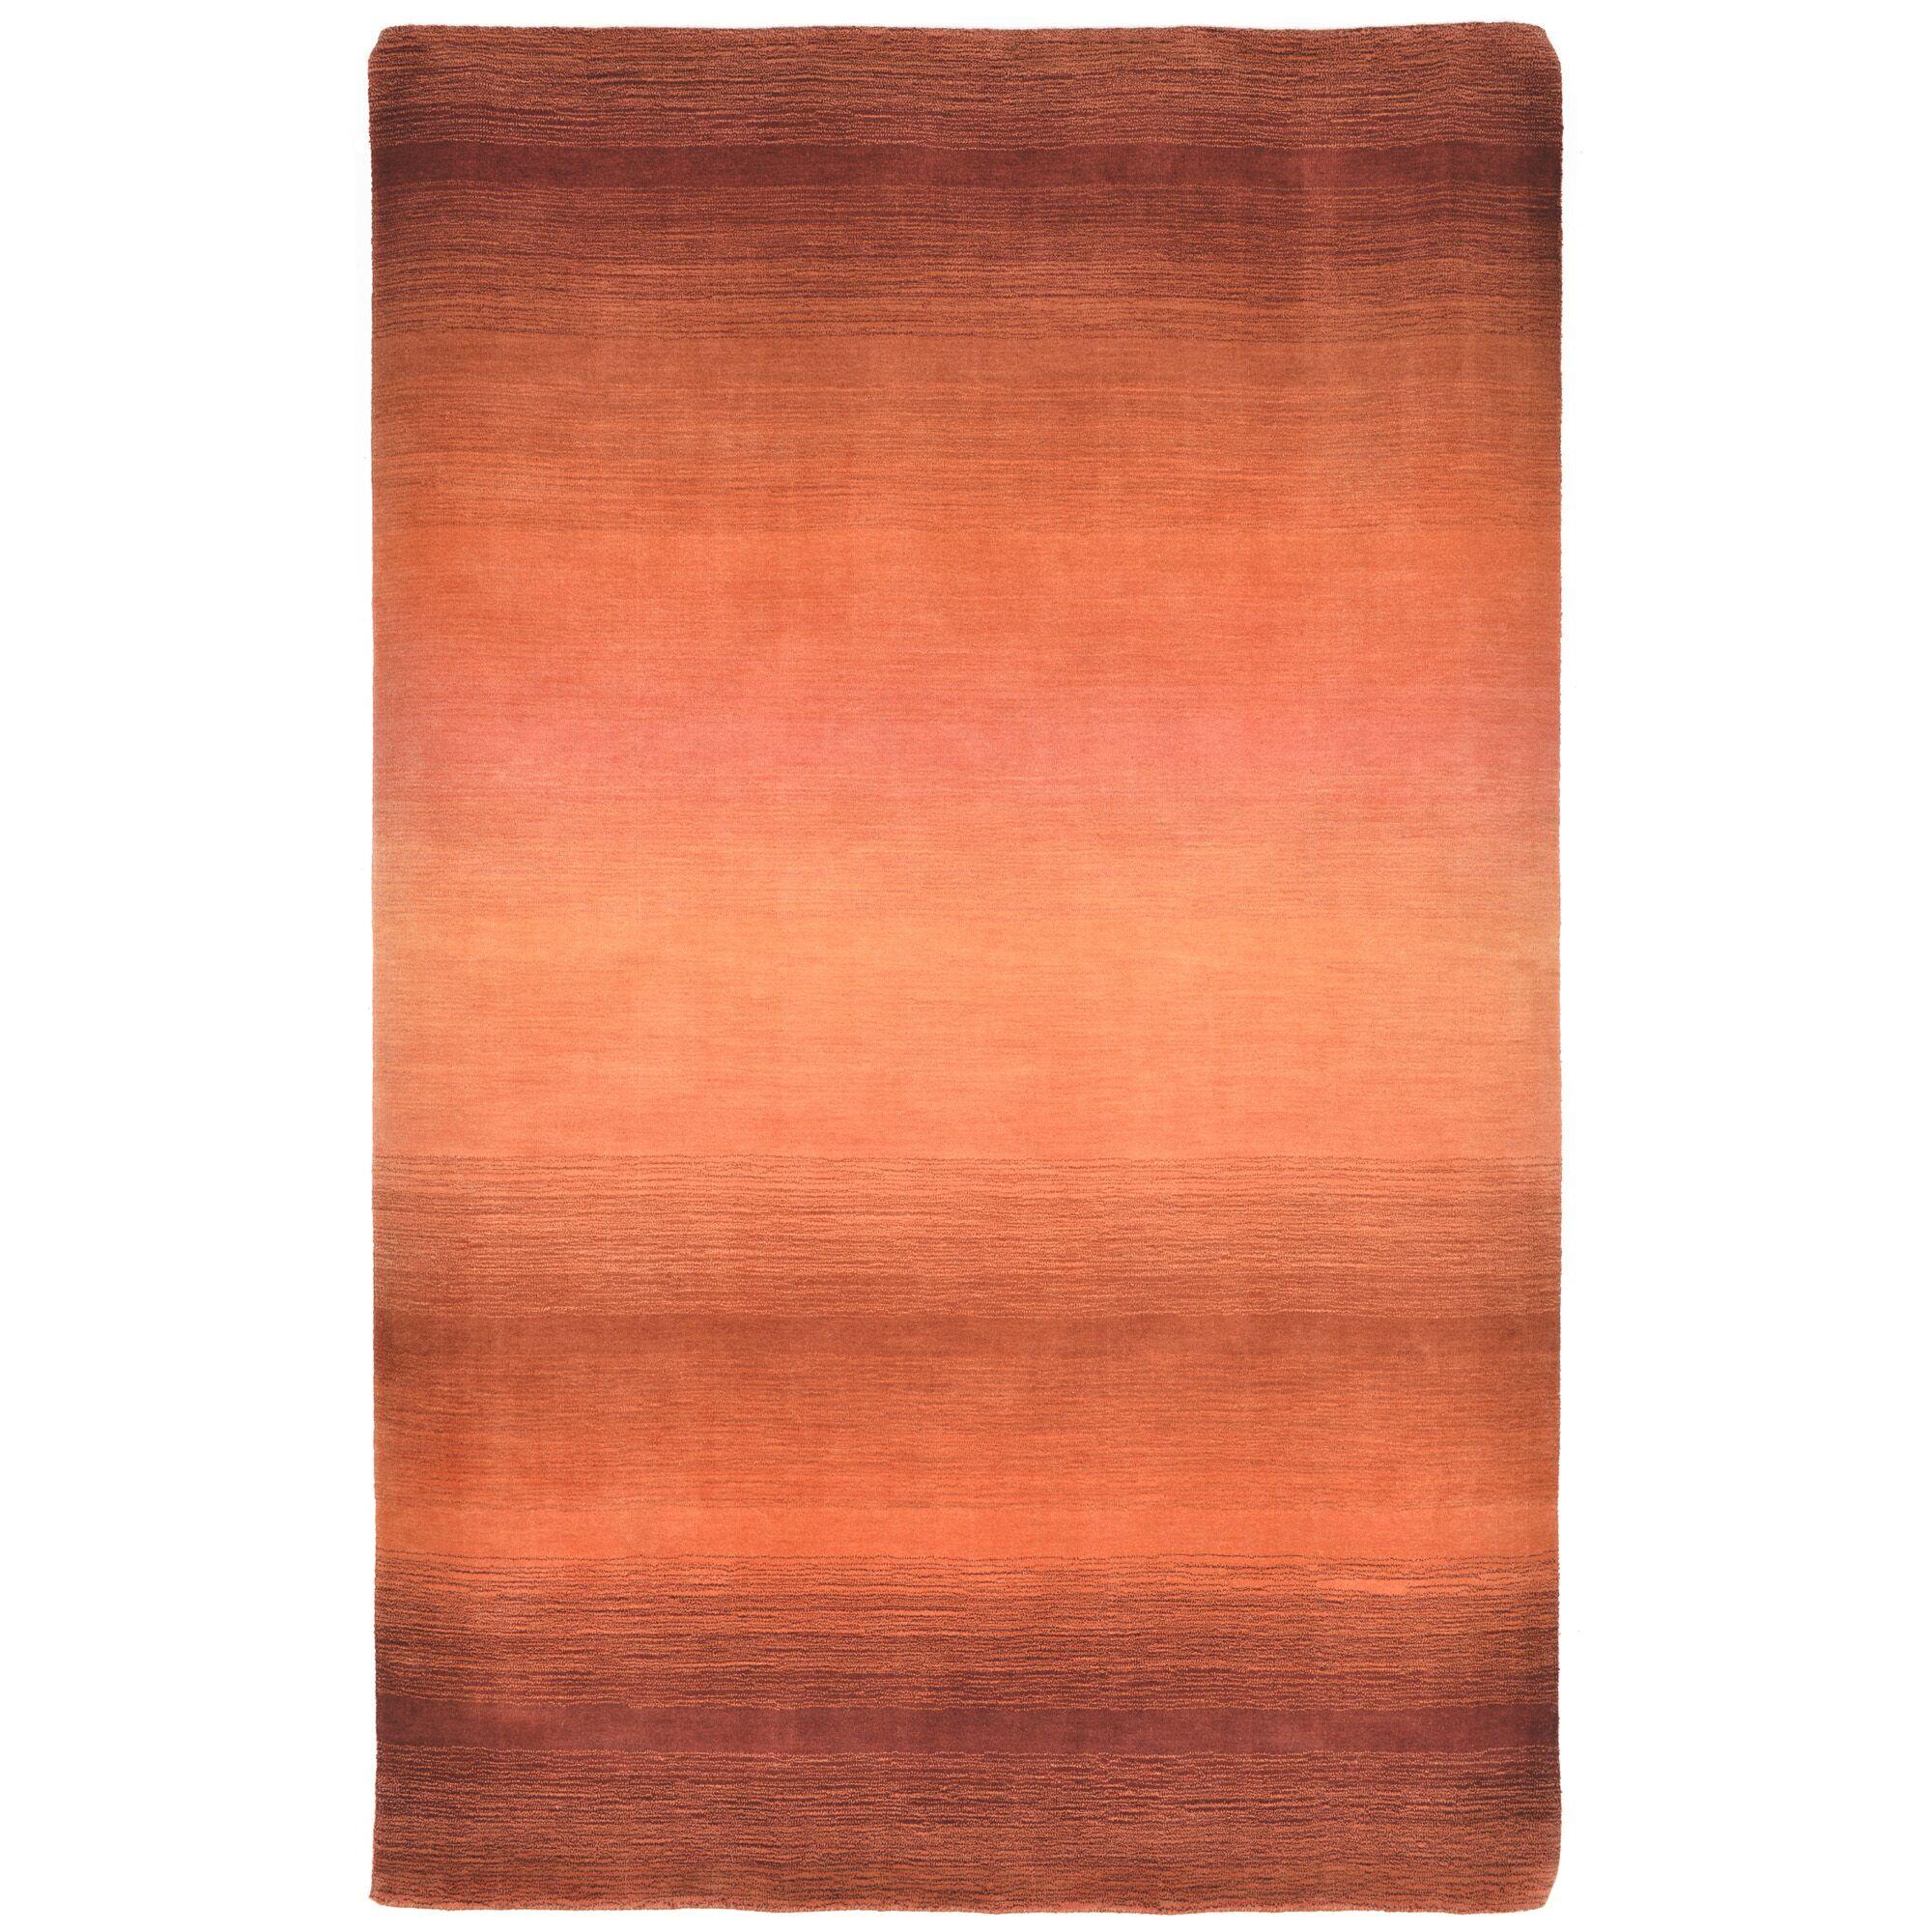 Hansford Hand-Loomed Orange Area Rug Rug Size: 5' x 8'